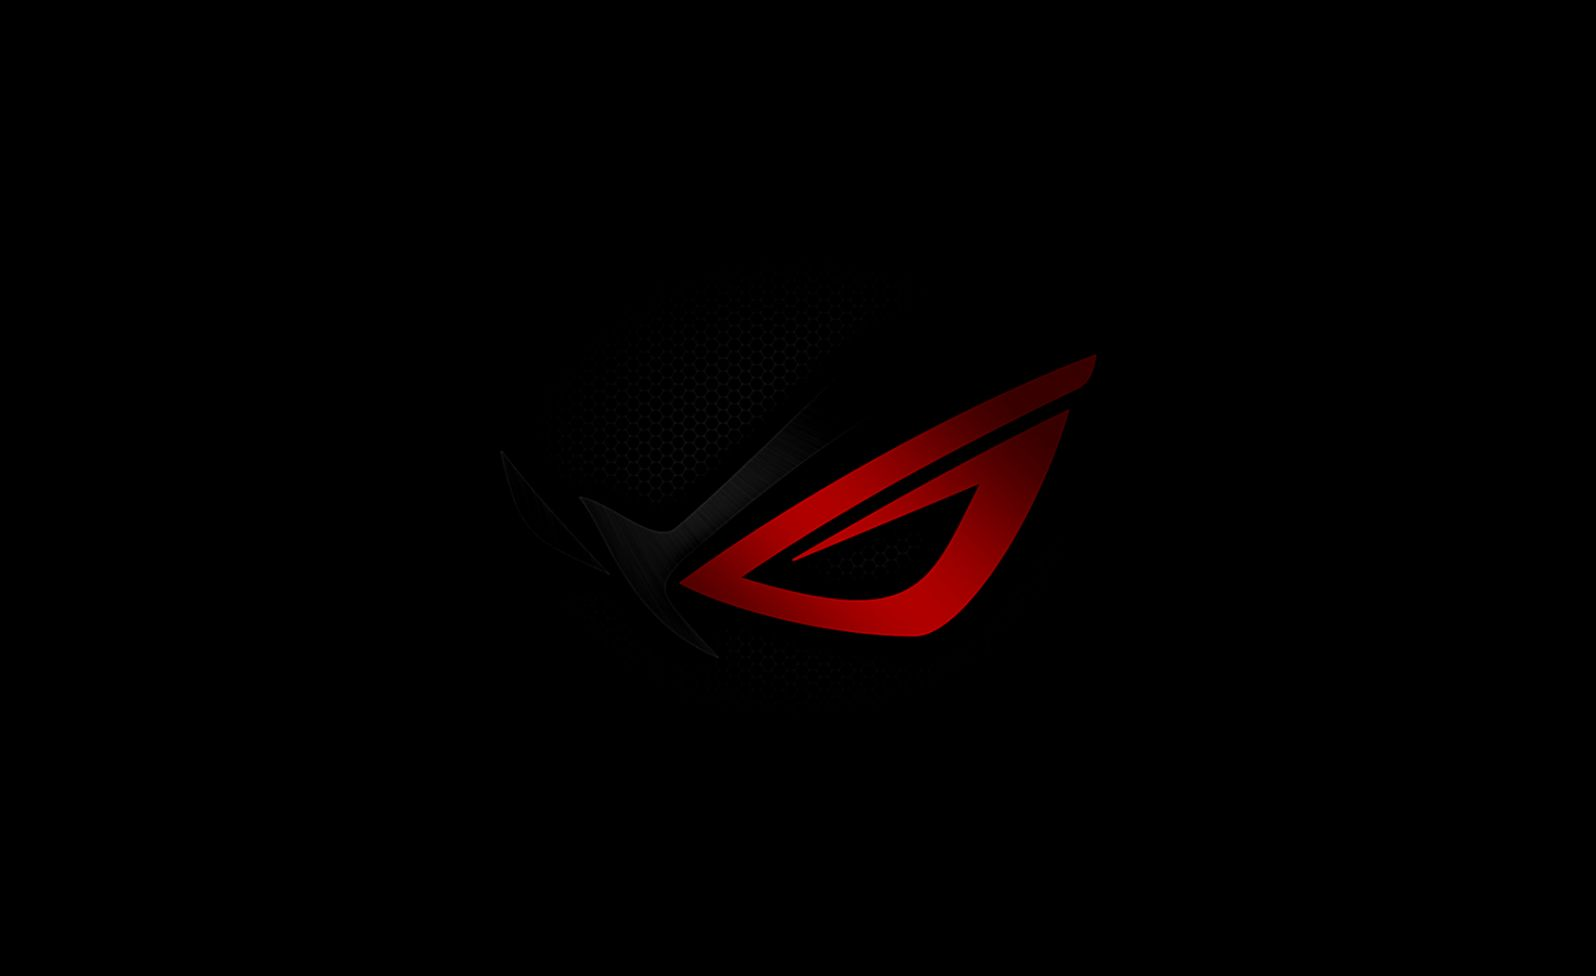 New asus rog logo hd wallpaper high definitions wallpapers - Gaming logo wallpaper ...